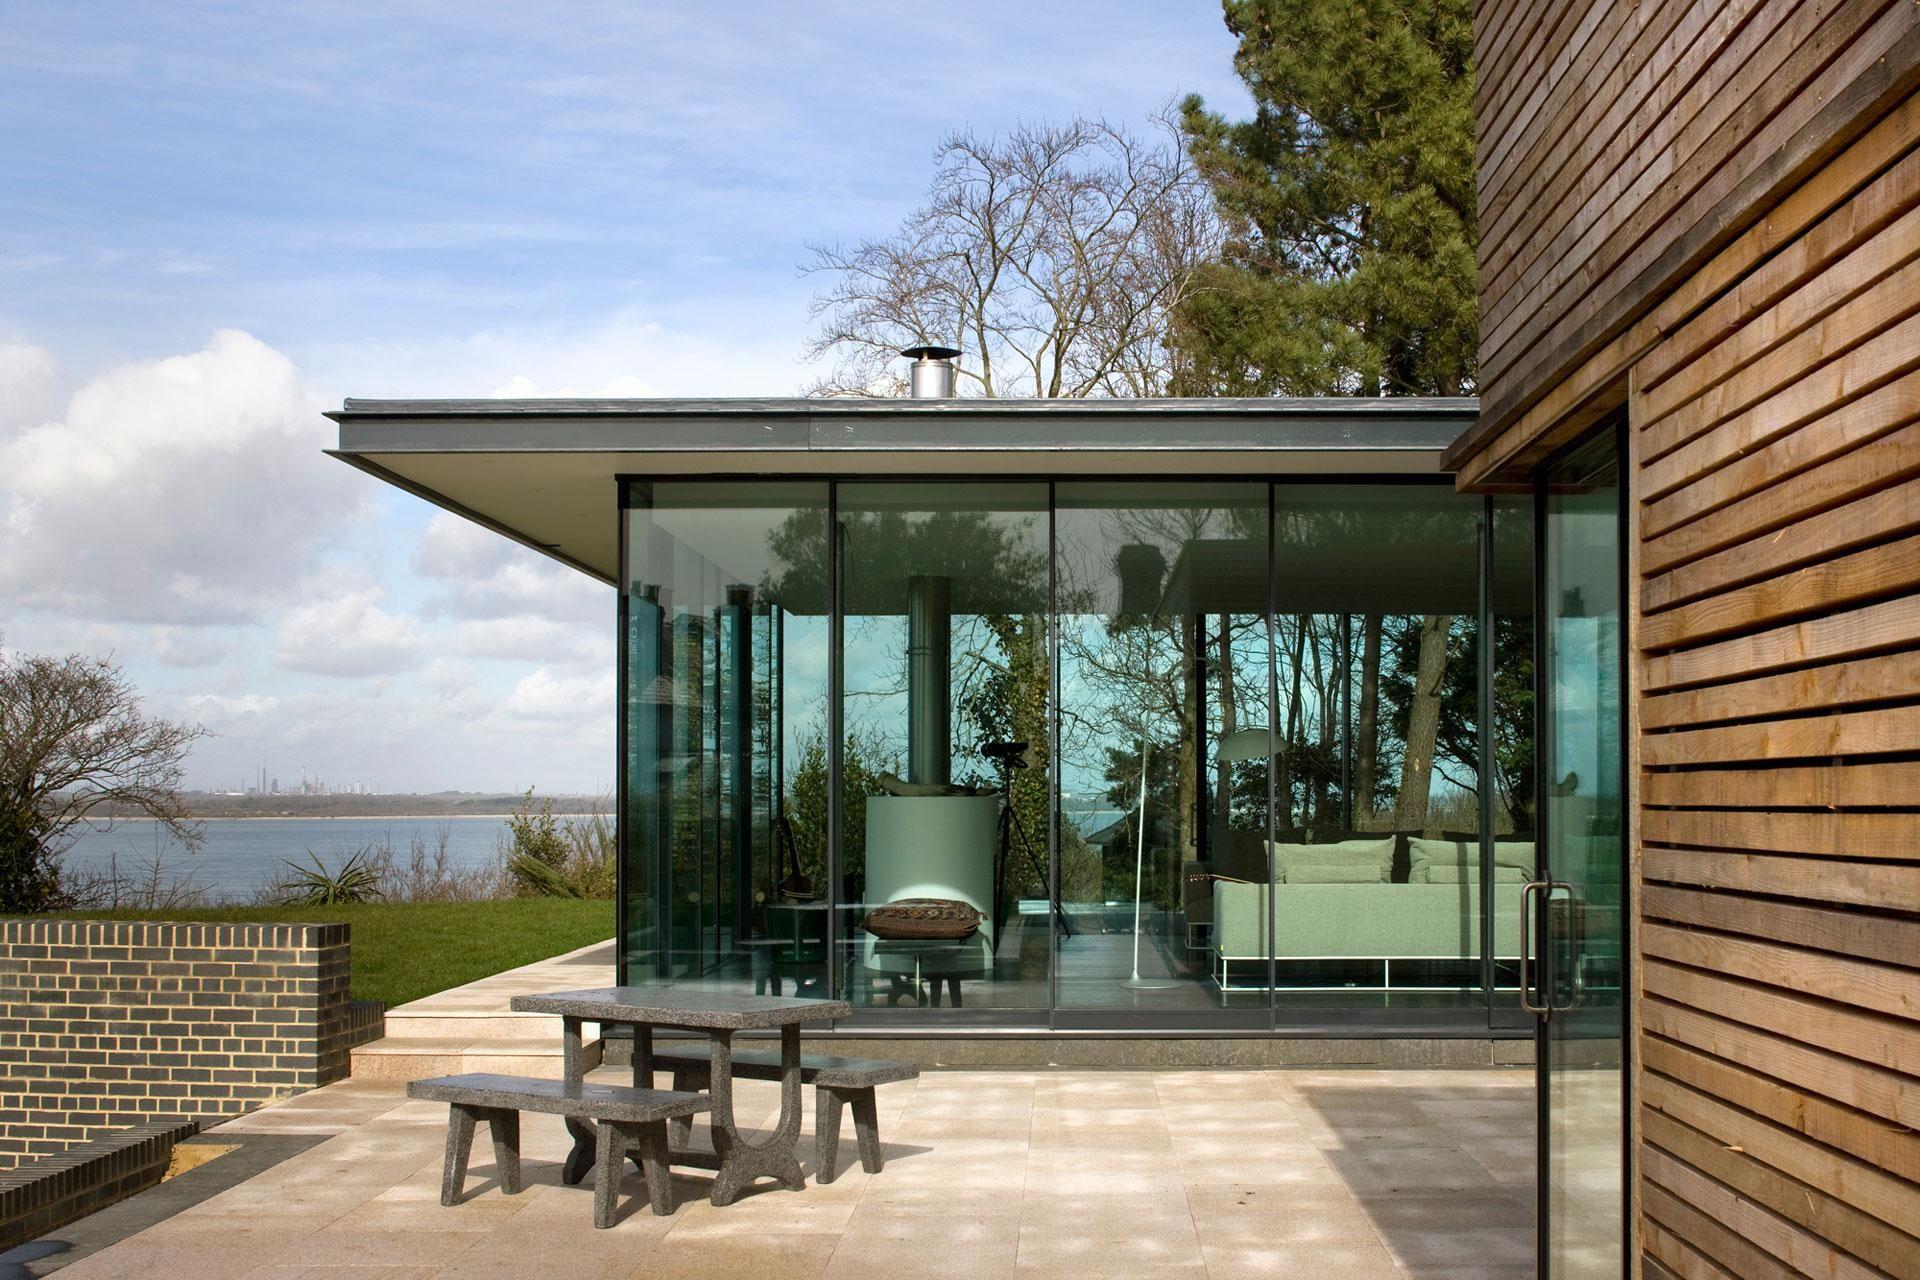 Fineline aluminium sliding doors & Fineline aluminium sliding doors | Honeywill House Moodboard ... pezcame.com